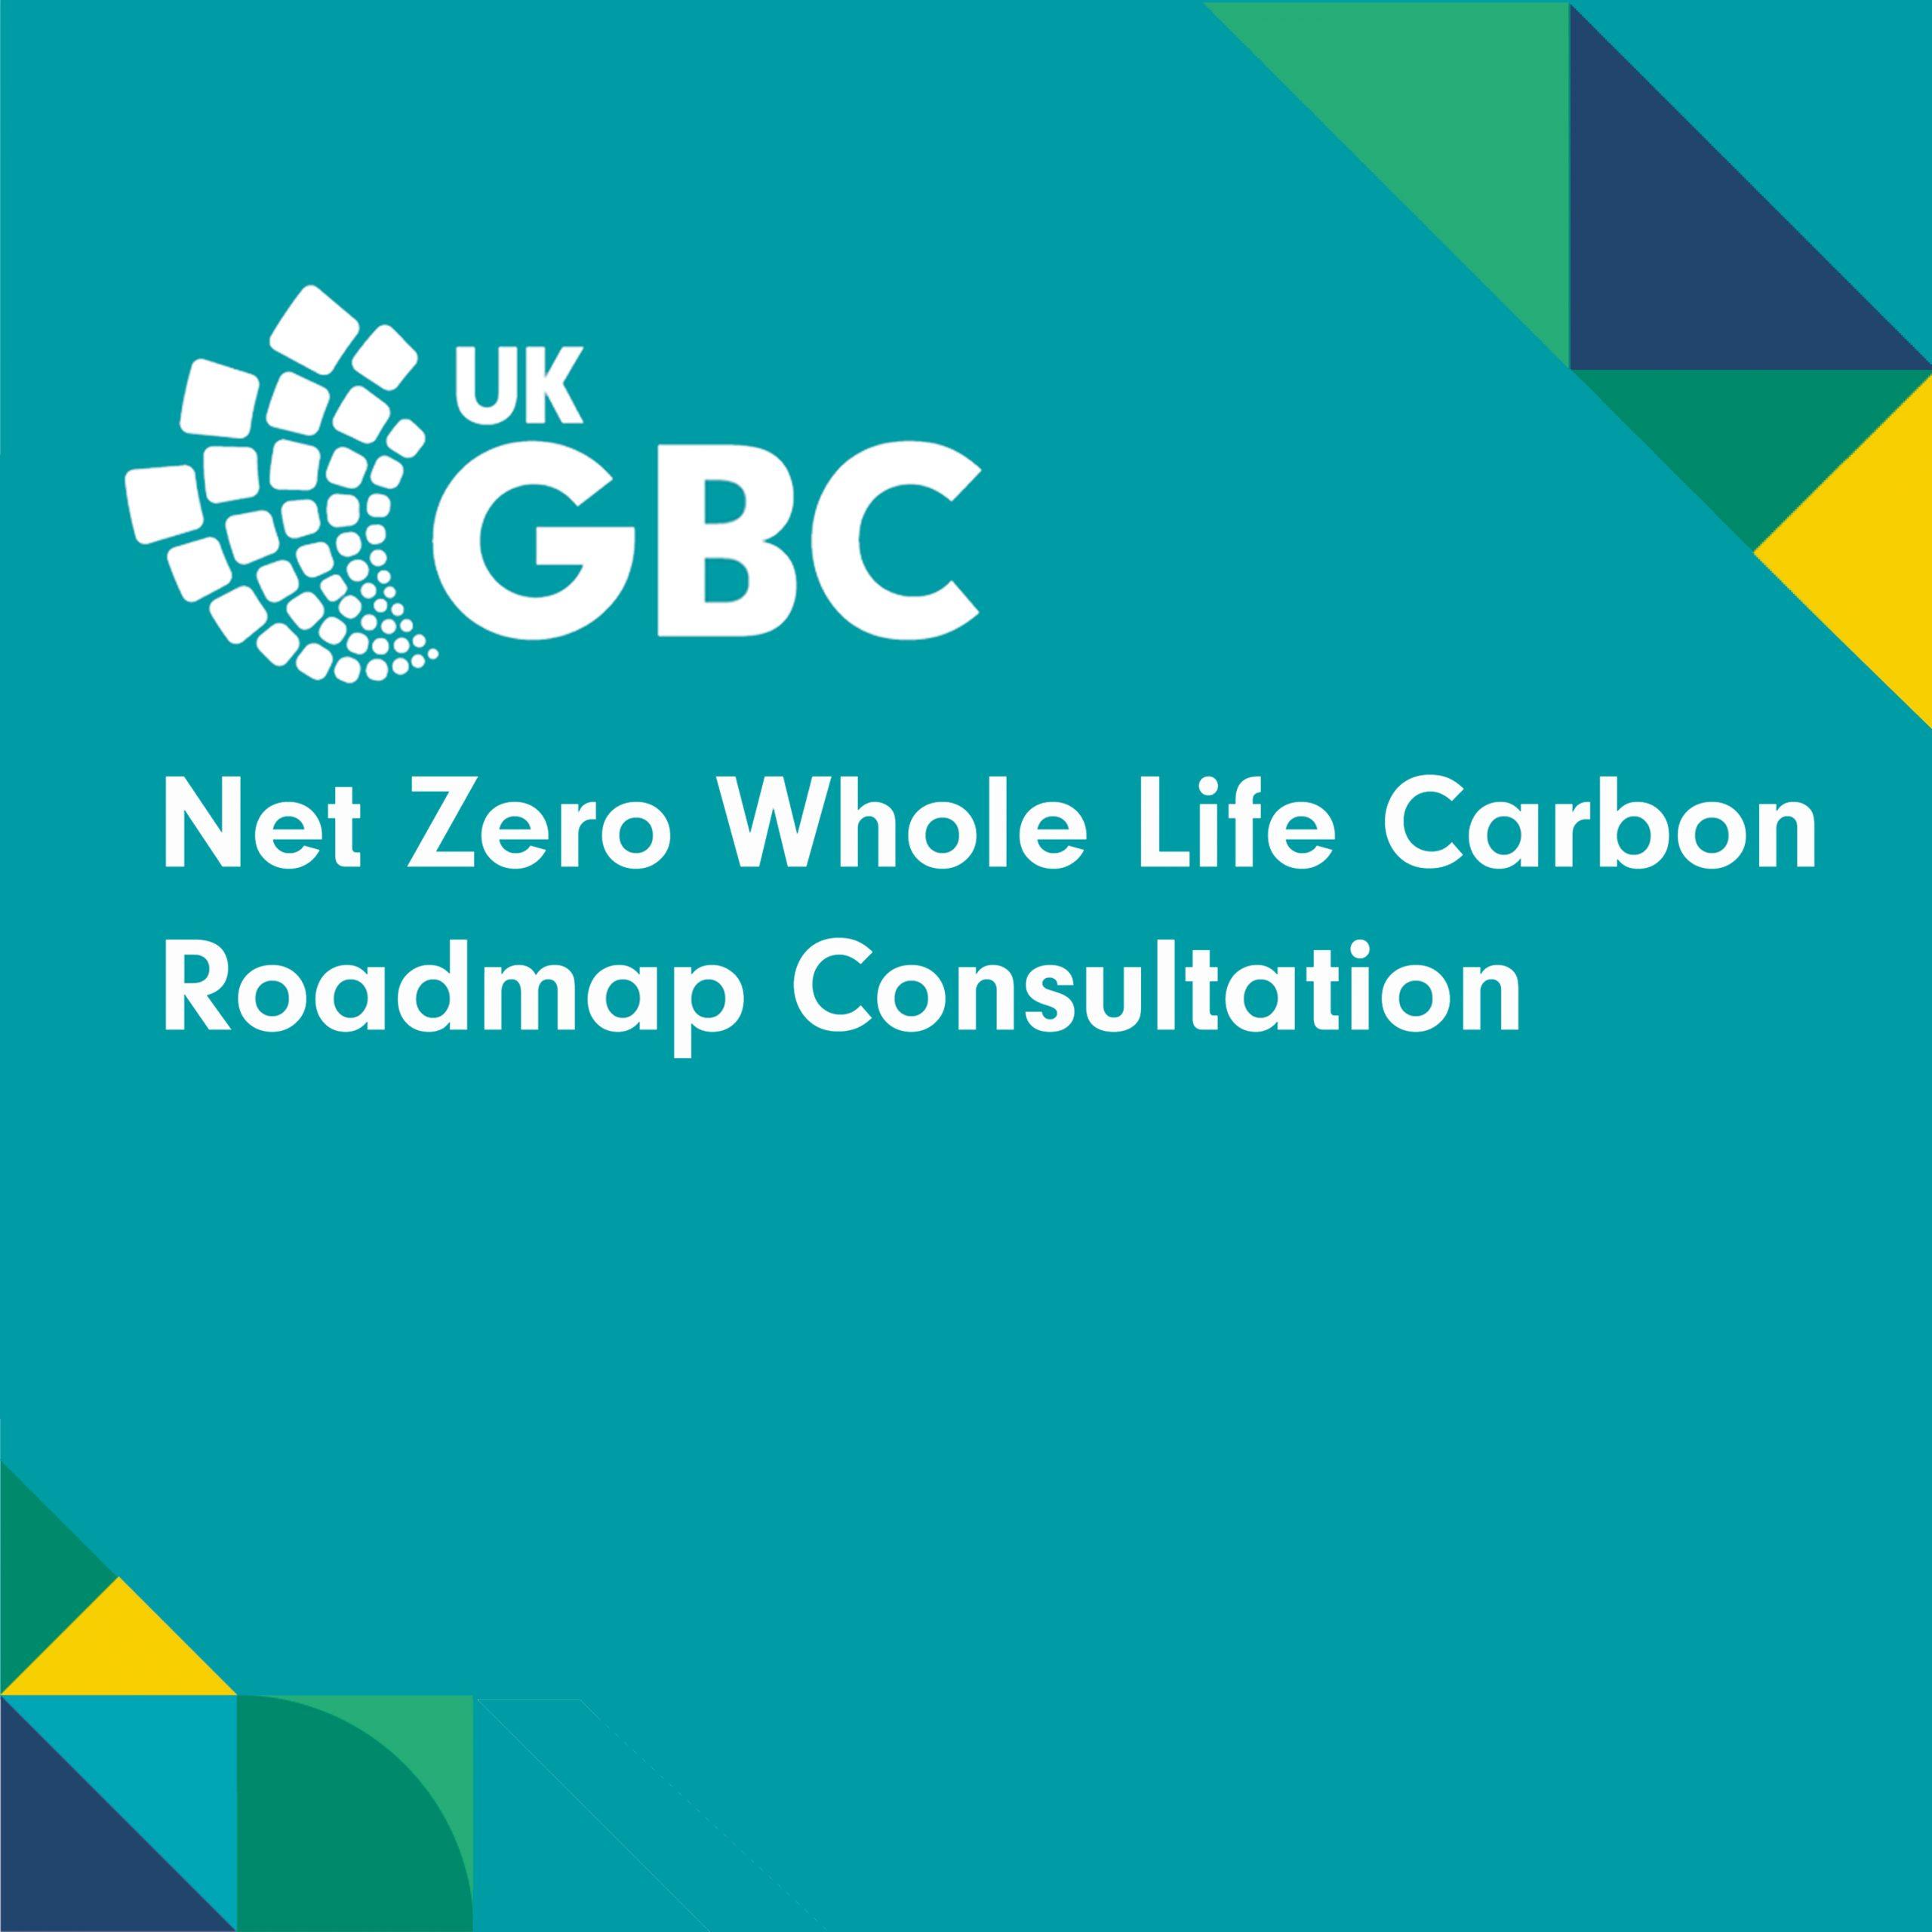 UKGBC consults on Net Zero Whole Life Carbon Roadmap